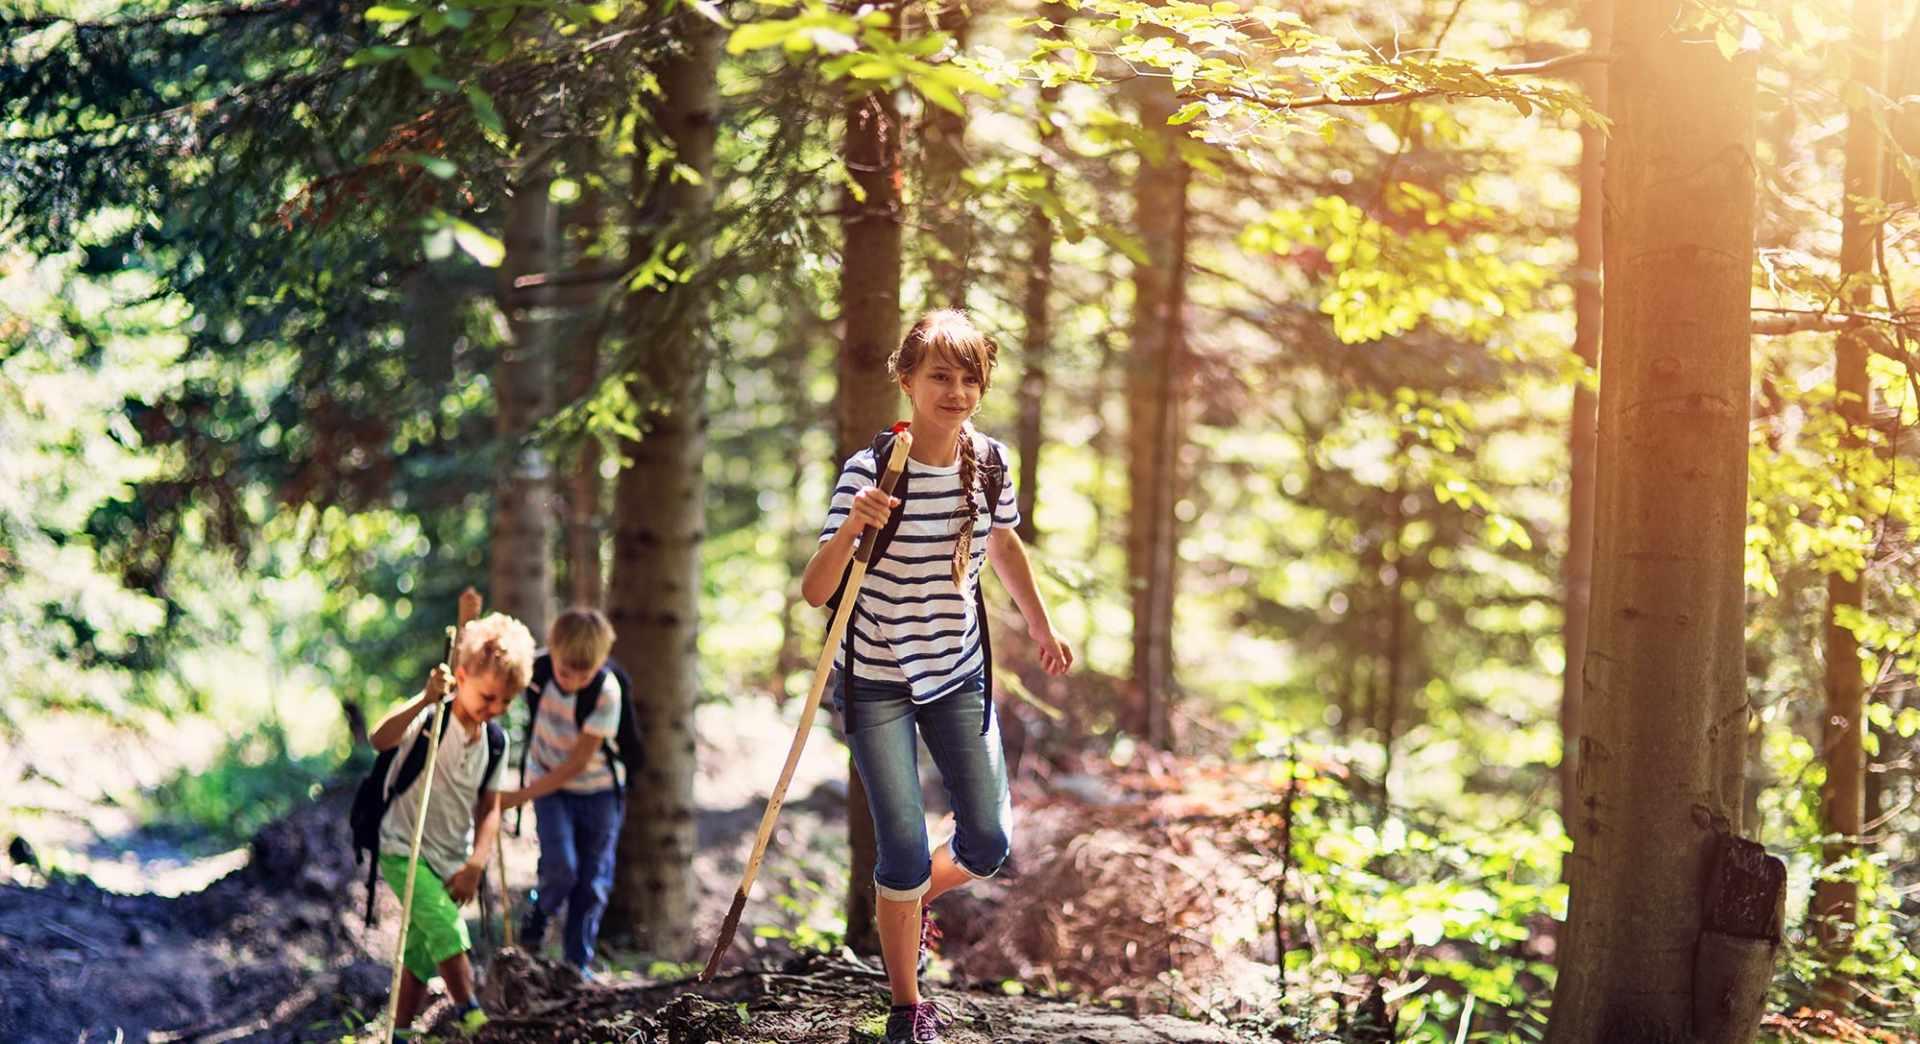 Familienerlebnisse im Wald